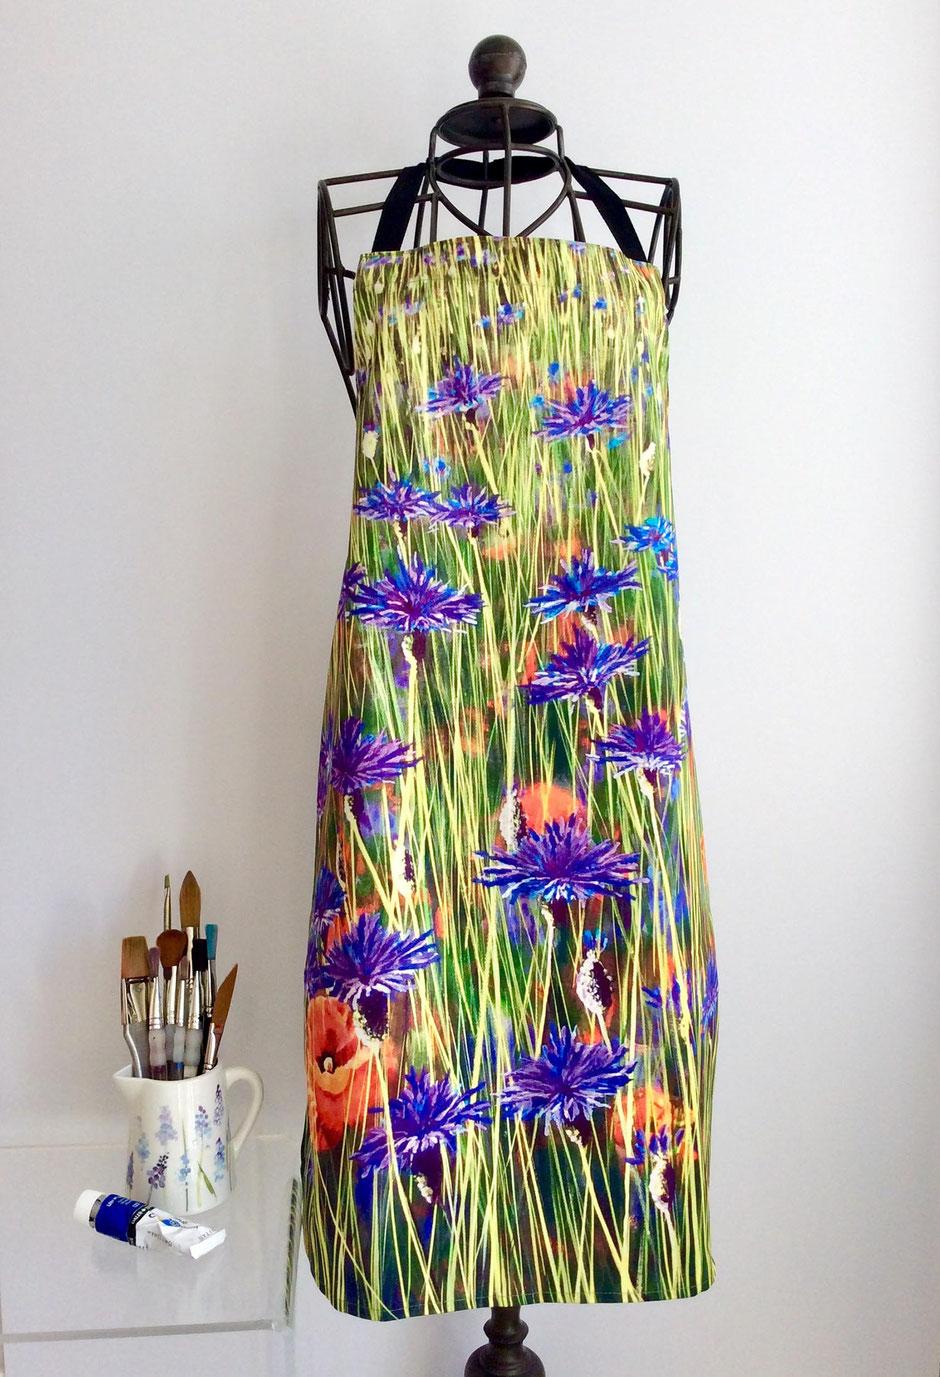 cornflowers cotton apron